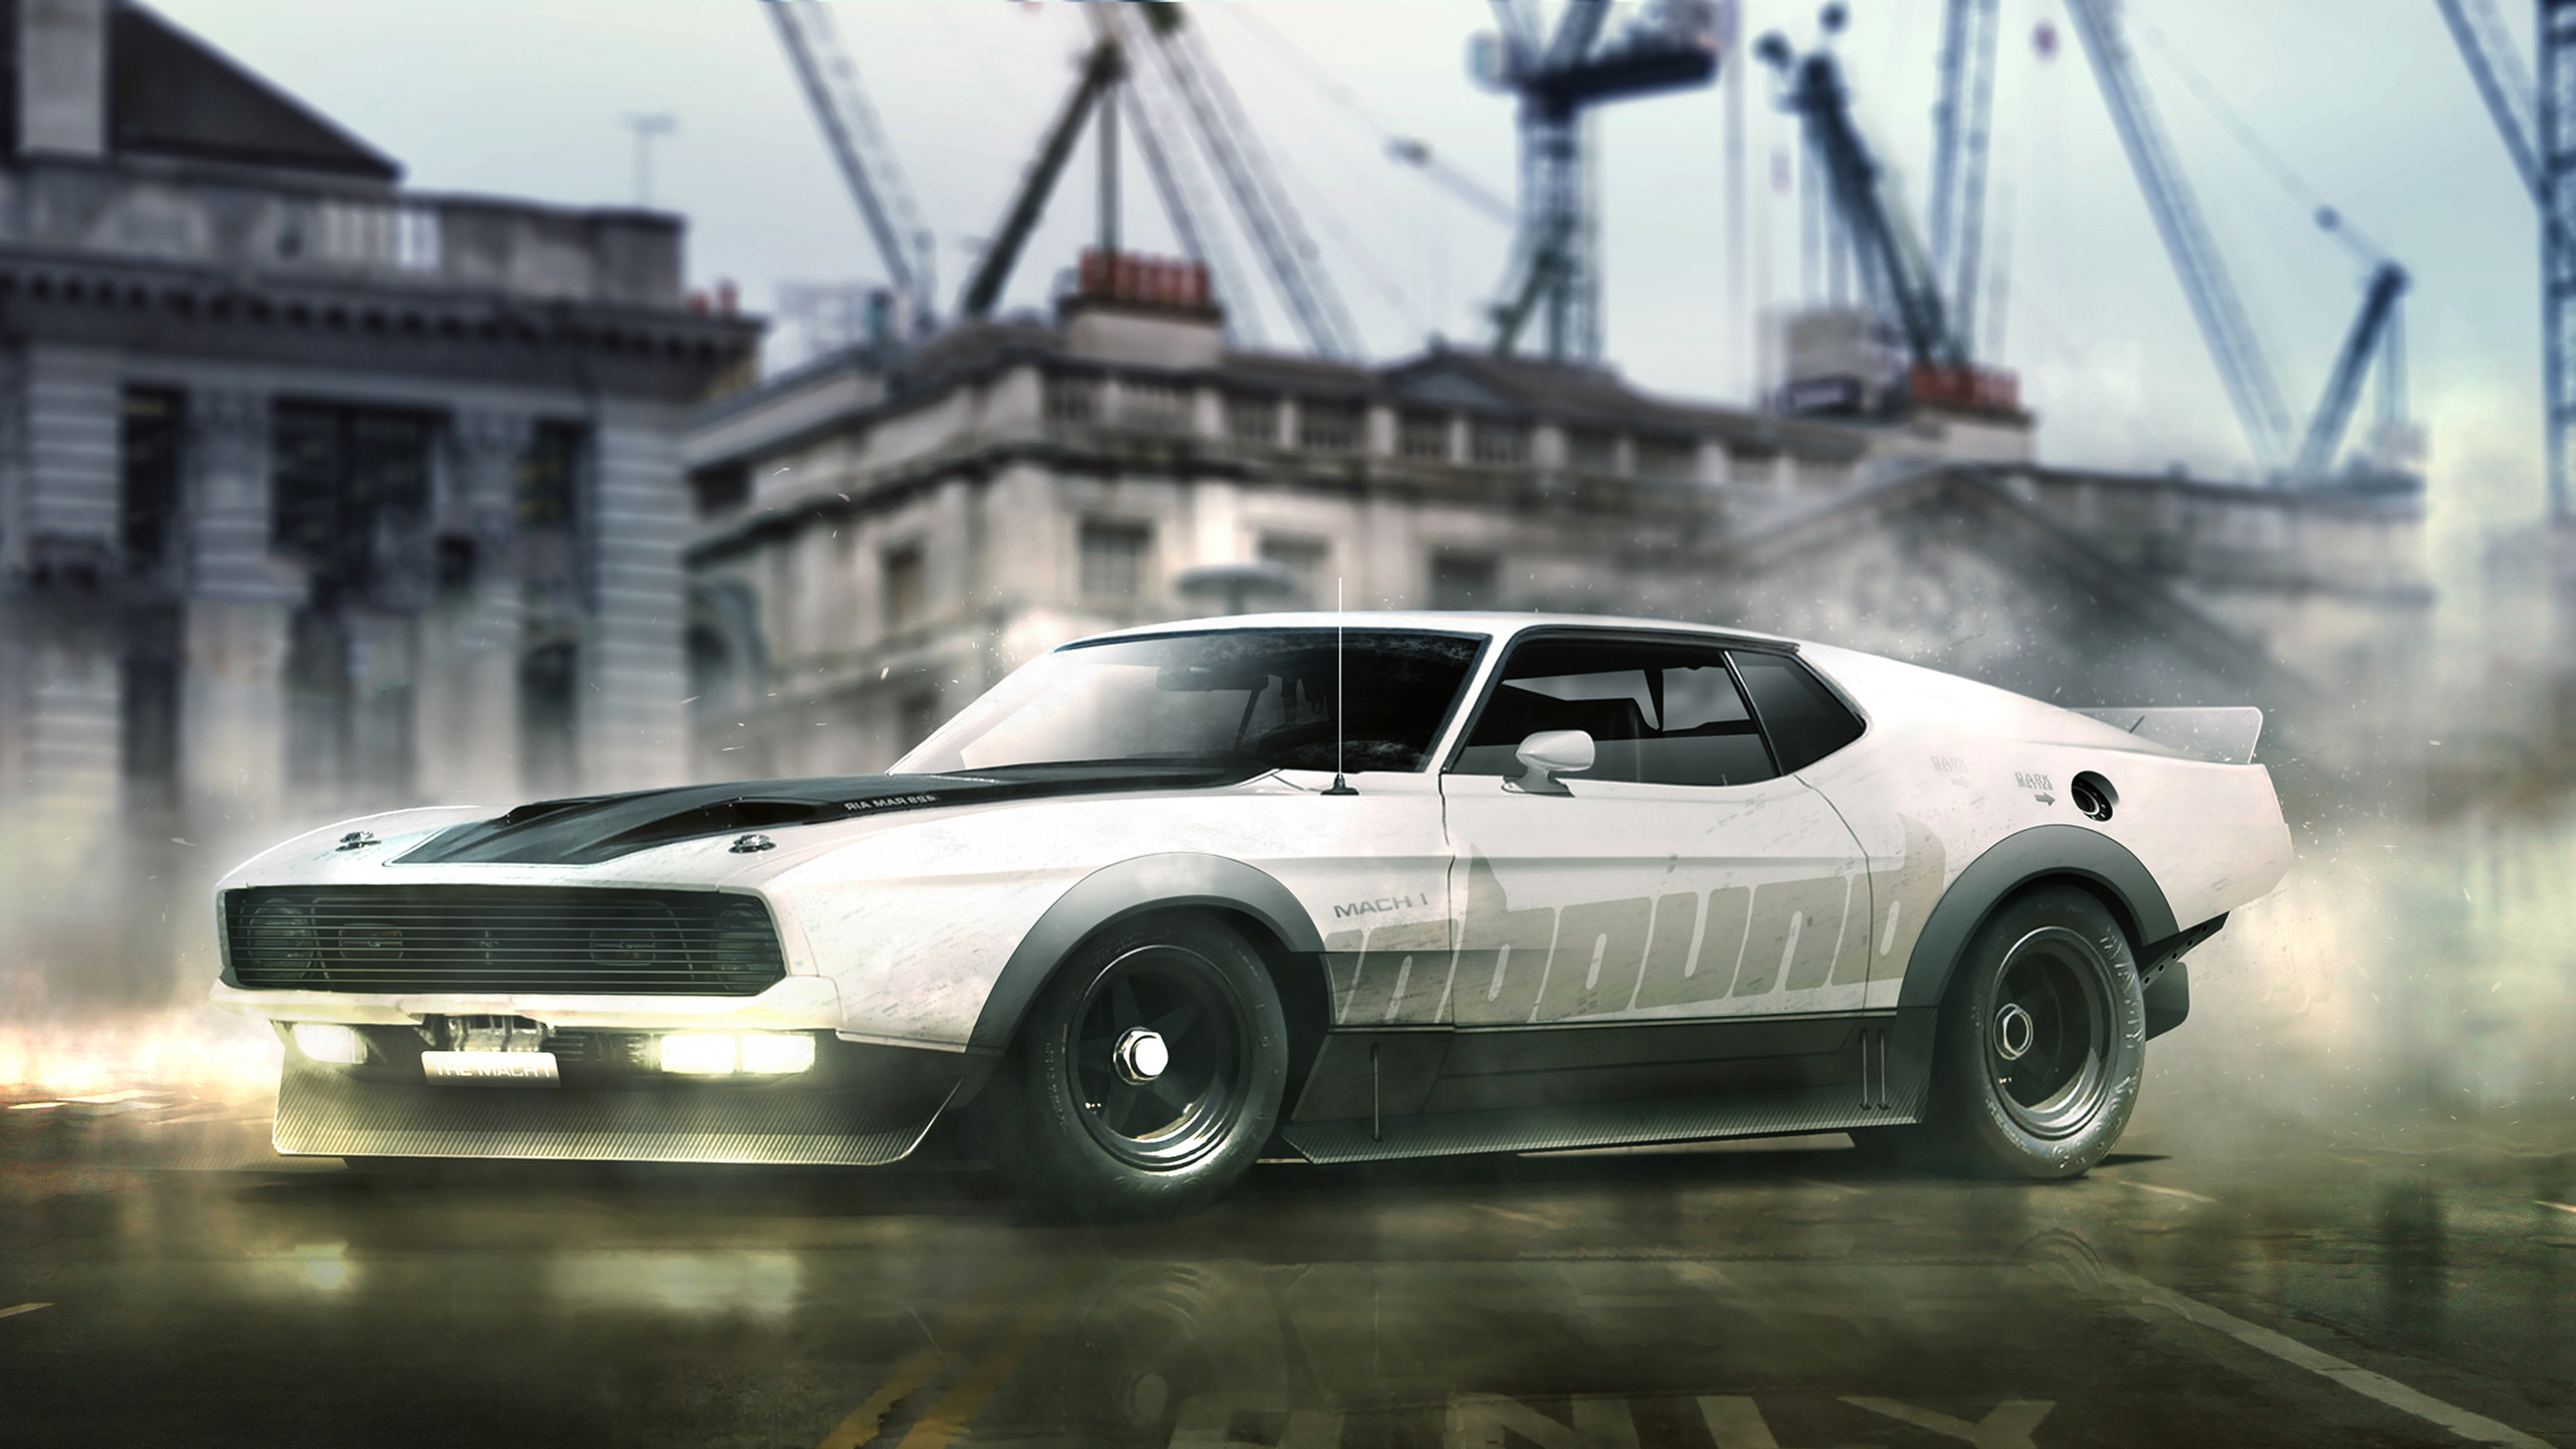 mustang mach 4k 1556185230 - Mustang Mach 4k - hd-wallpapers, ford mustang wallpapers, cars wallpapers, 4k-wallpapers